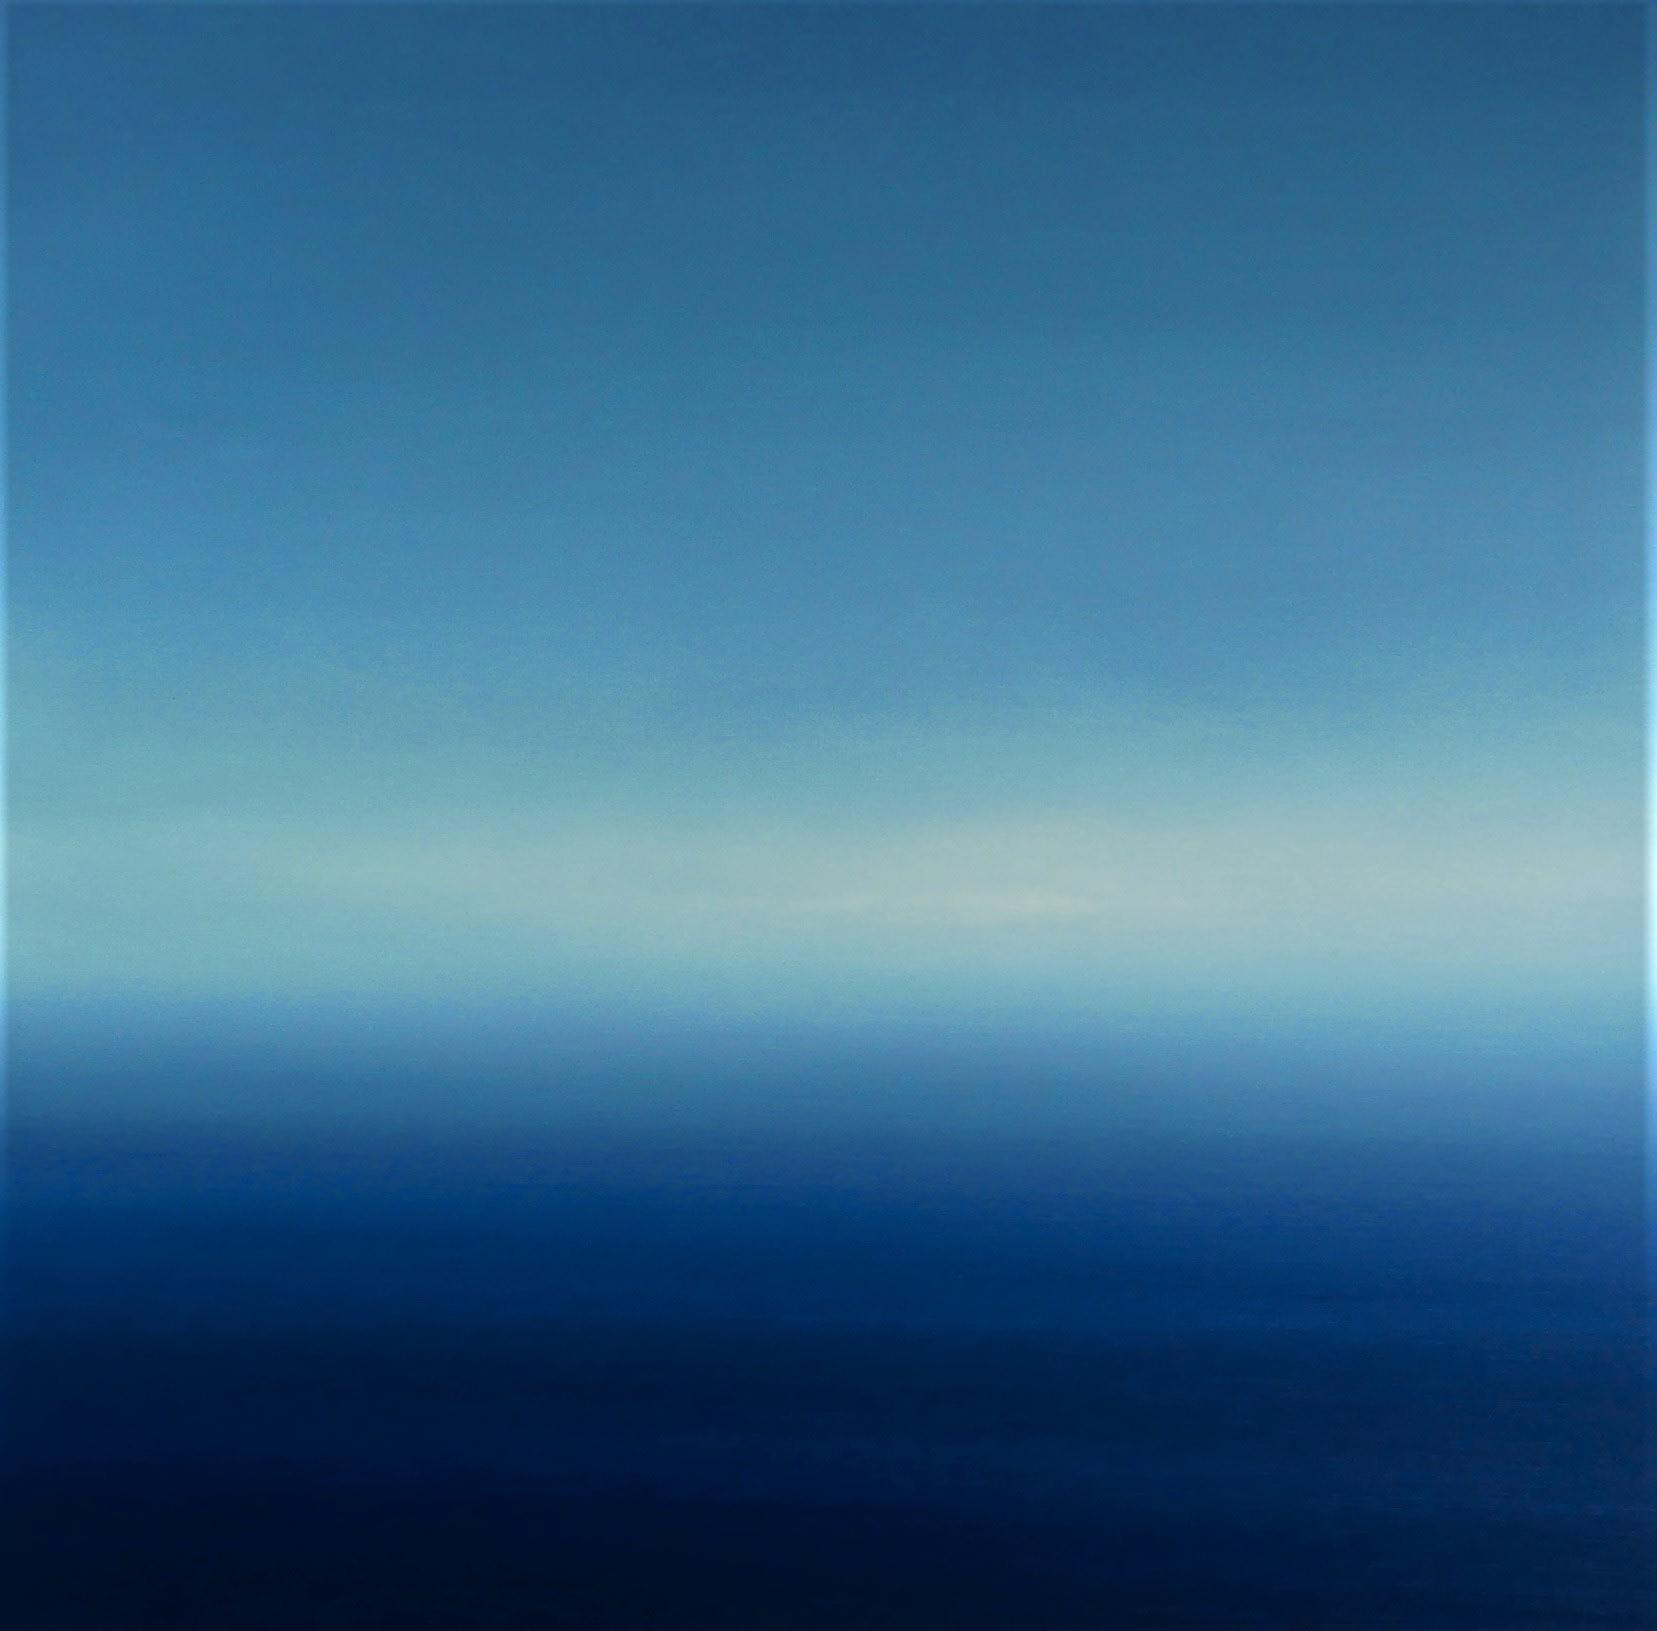 "<span class=""link fancybox-details-link""><a href=""/artists/78-martyn-perryman/works/7399-martyn-perryman-eternal-sea-st-ives-2021/"">View Detail Page</a></span><div class=""artist""><strong>Martyn Perryman</strong></div> b. 1963 <div class=""title""><em>Eternal Sea St Ives</em>, 2021</div> <div class=""medium"">oil on canvas</div> <div class=""dimensions"">h. 80 x w. 80 cm </div><div class=""copyright_line"">Ownart: £99 x 10 Months, 0% APR</div>"